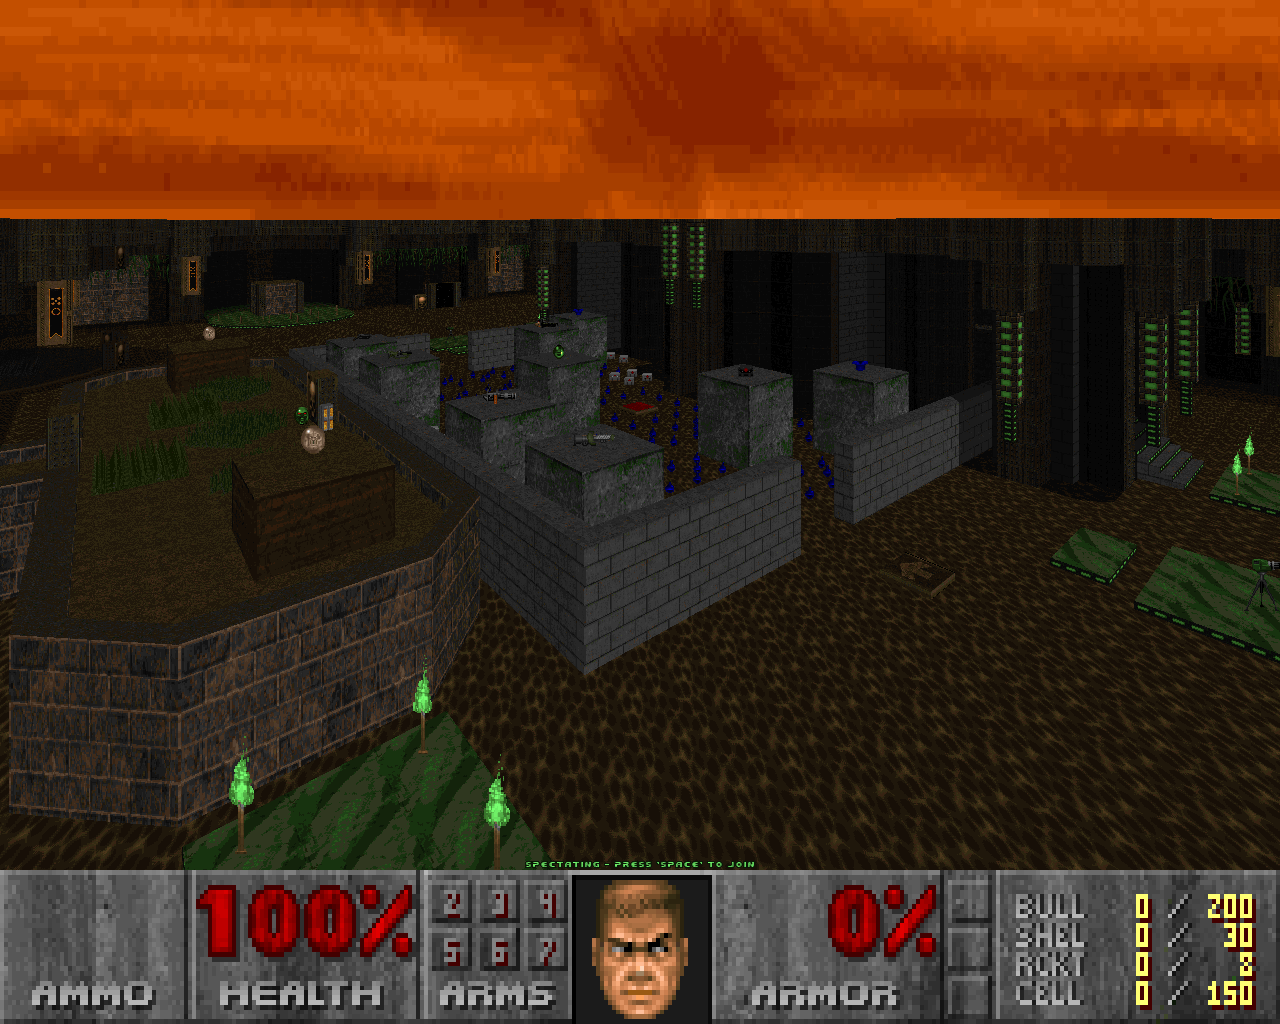 Screenshot_Doom_20200802_083850.png.f2b52bbf5f69d12dc38f60ce53cbf97b.png